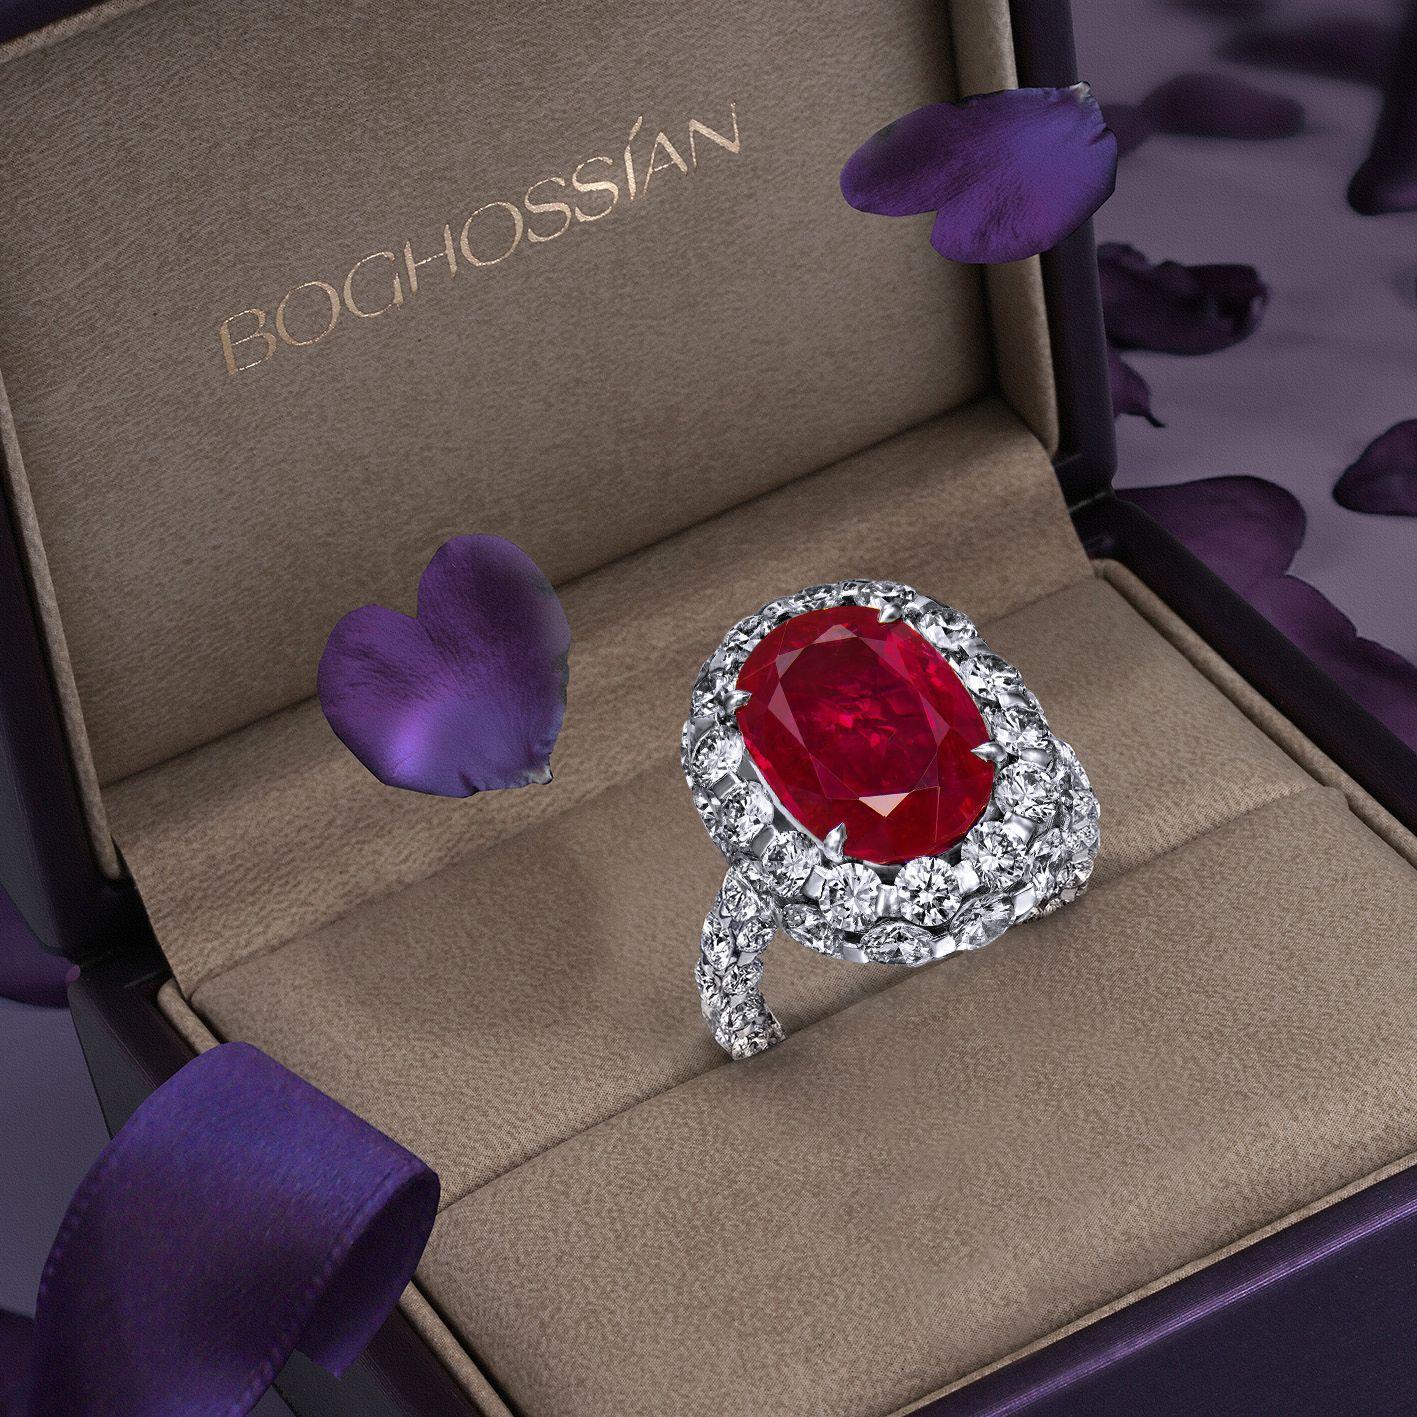 6 Standout Jewellery Pieces from Boghossian, A Purveyor of Gems